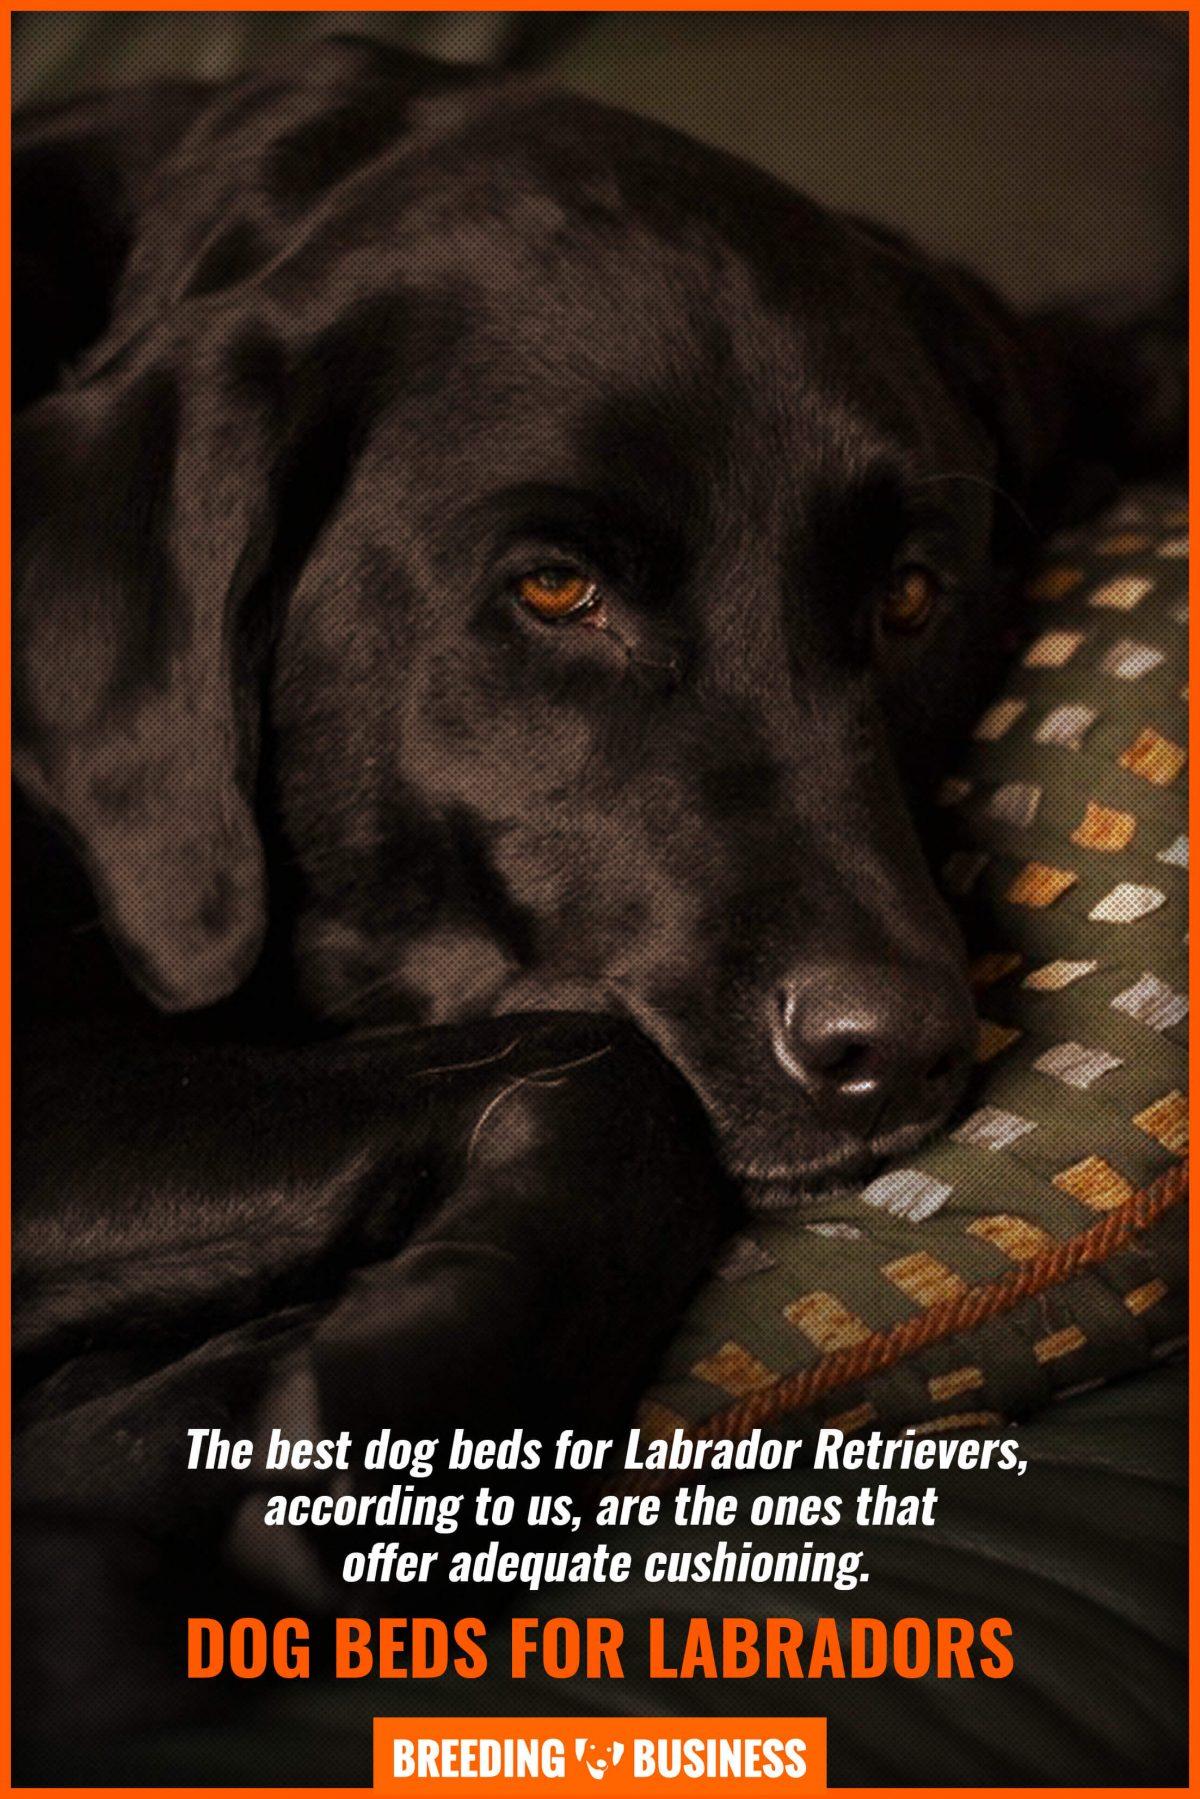 dog beds for labradors